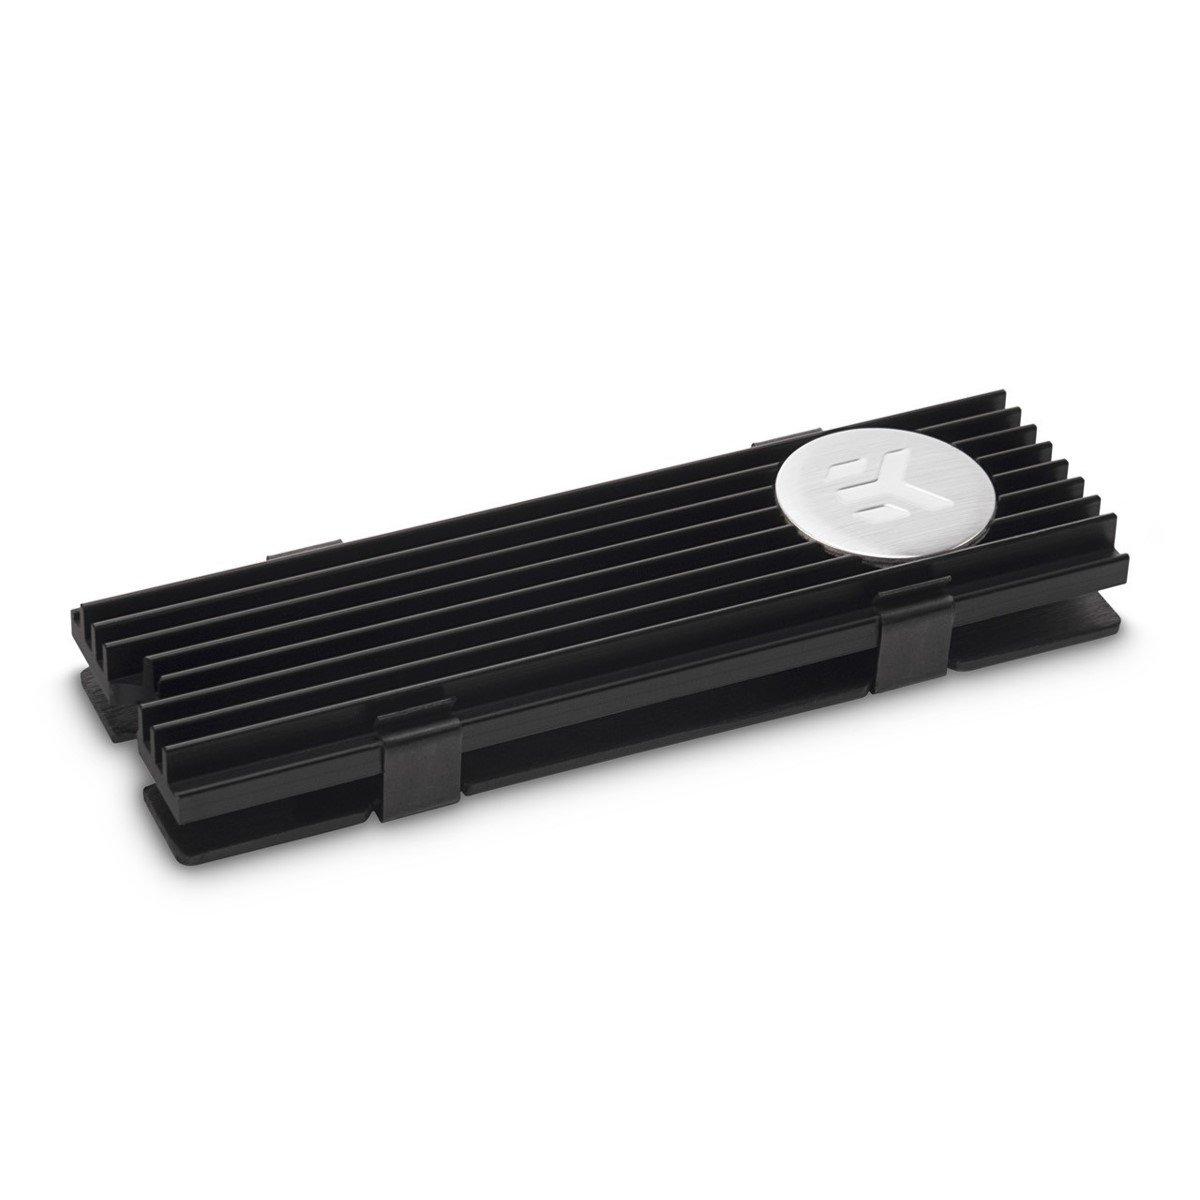 EKWB EK-M.2 NVMe Heatsink- Black